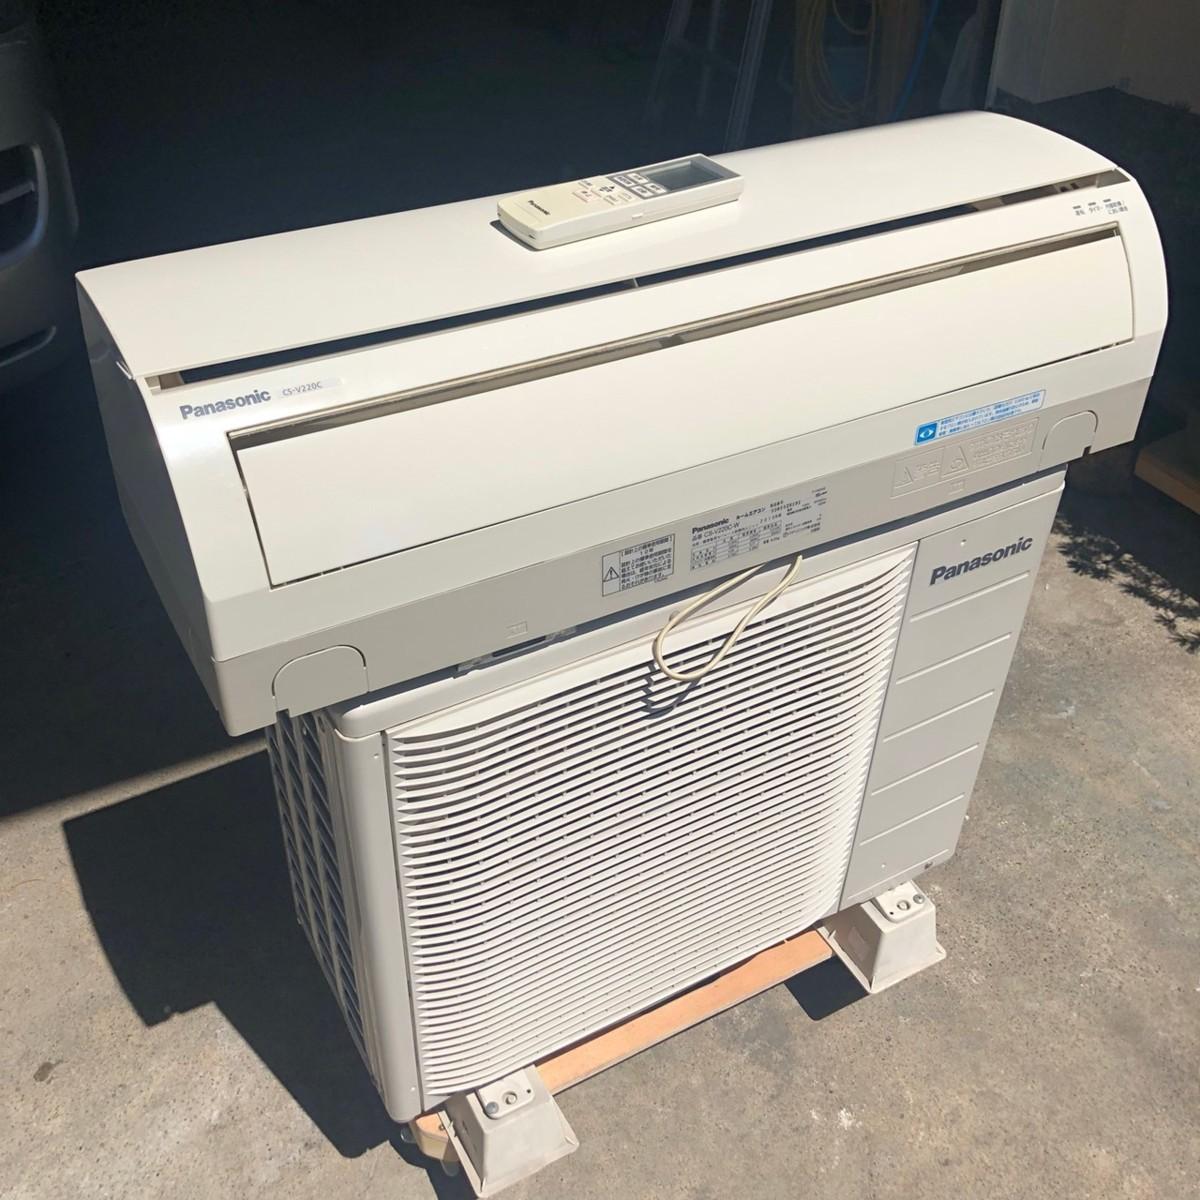 【G1164】2010年製 Panasonic パナソニック セパレート型ルームエアコン CS-V220C-W 冷房(6~9畳) 暖房 (5~6畳) 洗浄済み 空調 壁掛けの1番目の画像